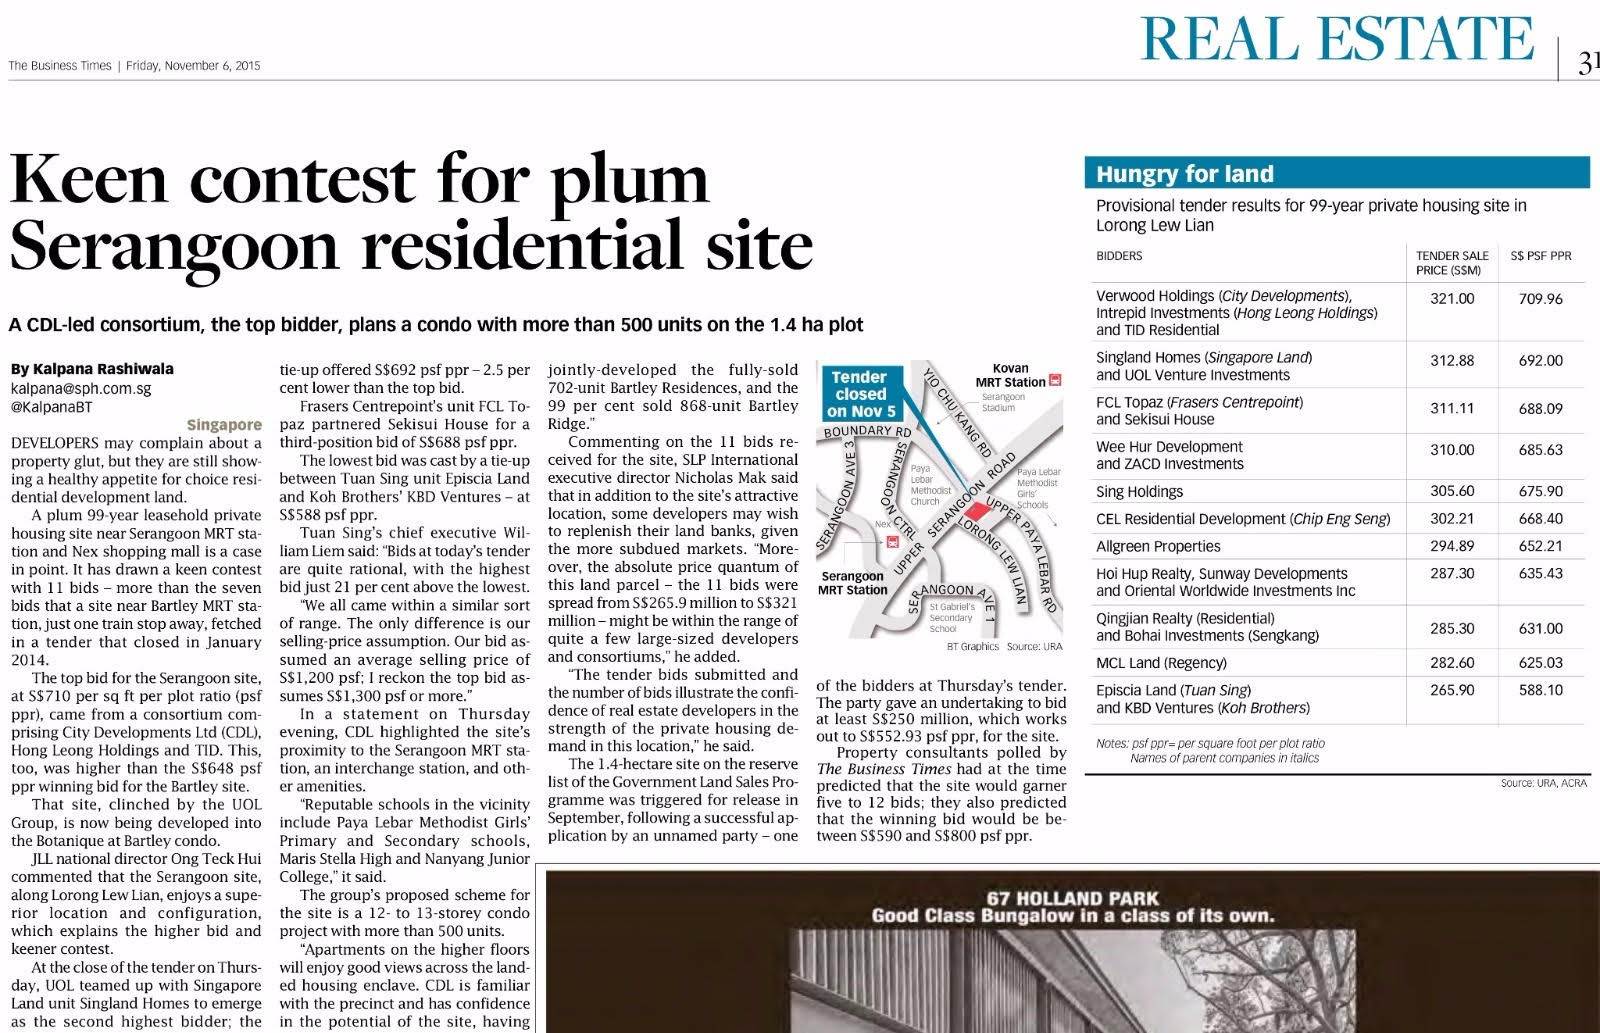 Lorong Liew Lian bidded site